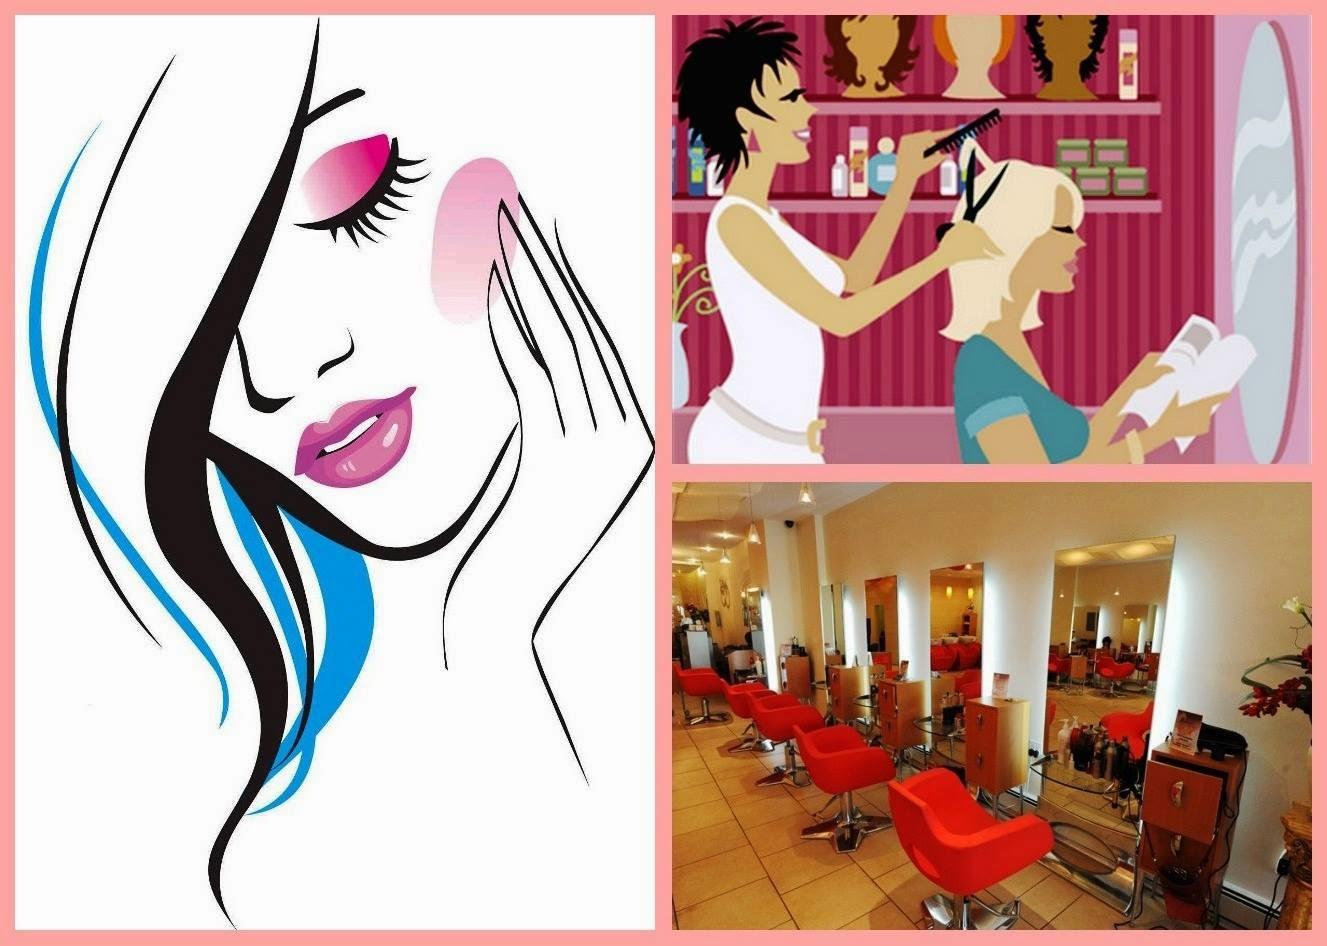 маргошвили картинки реклам салонов красоты мама